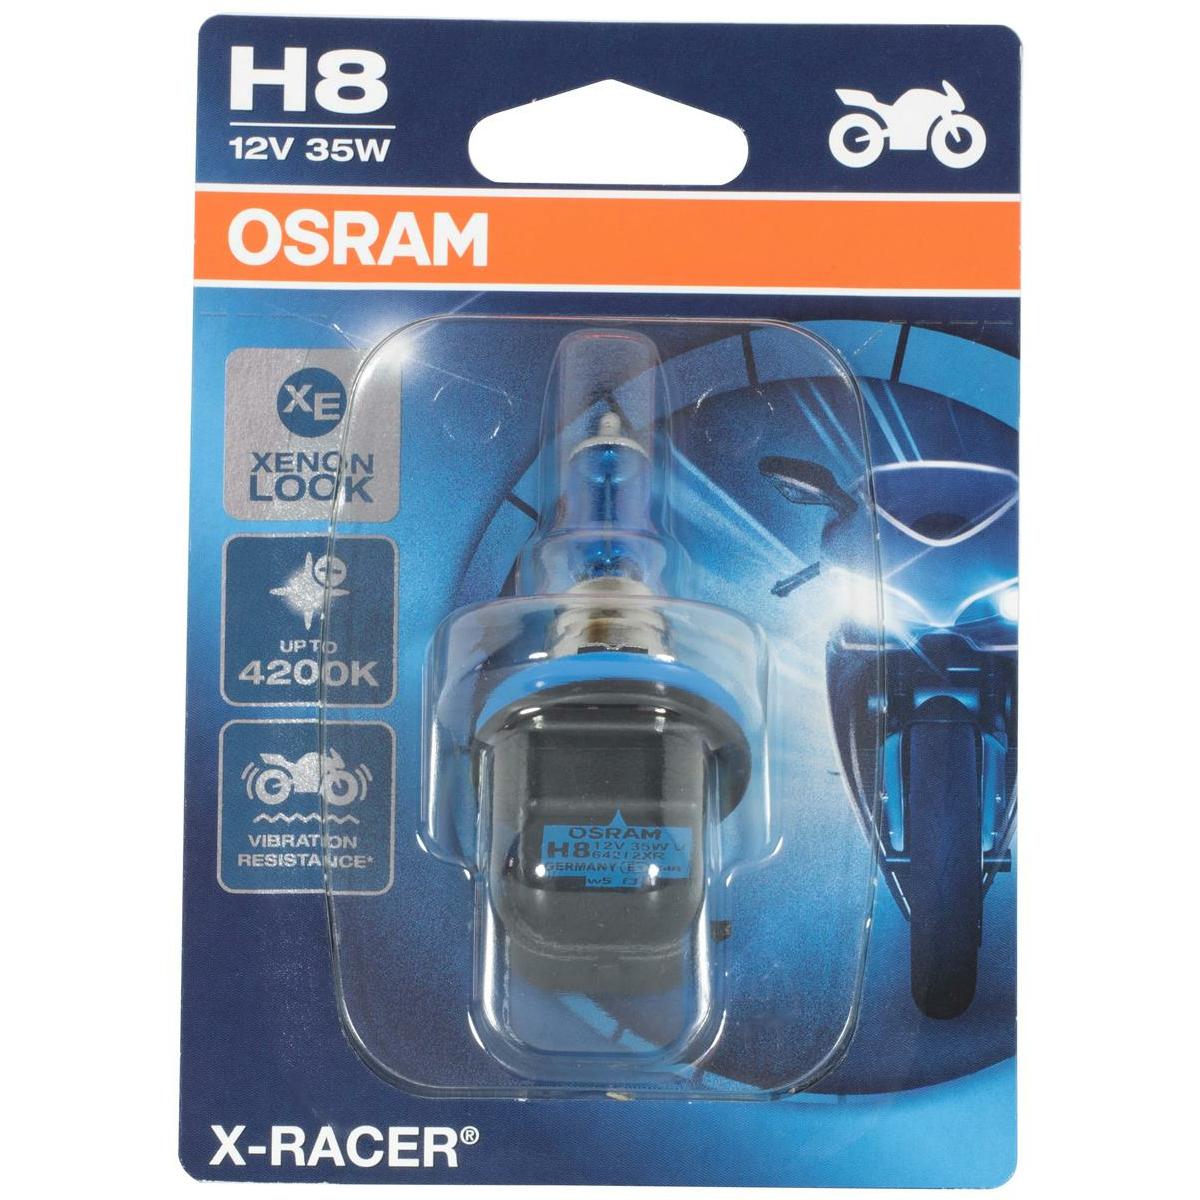 Osram 64212XR-01B X-RACER H8 Halogen motorcycle headlight lamp, single blister (1 piece)